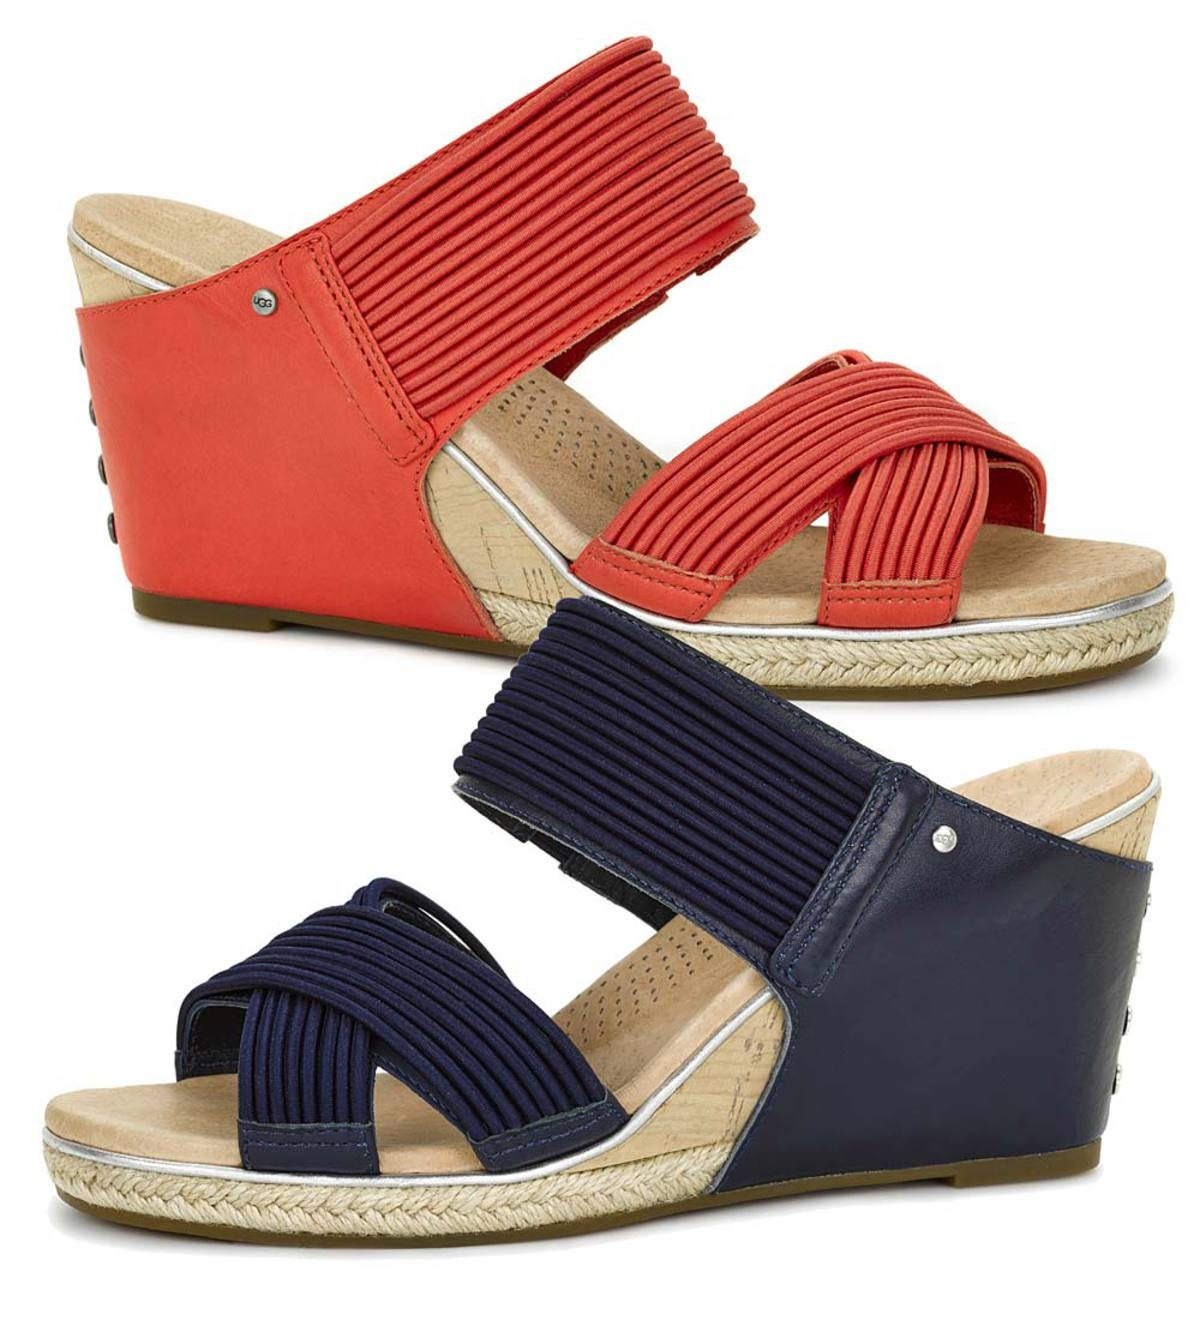 ab95abef423 UGG Women's Hilarie Slip-On Wedge Sandals | PlowHearth